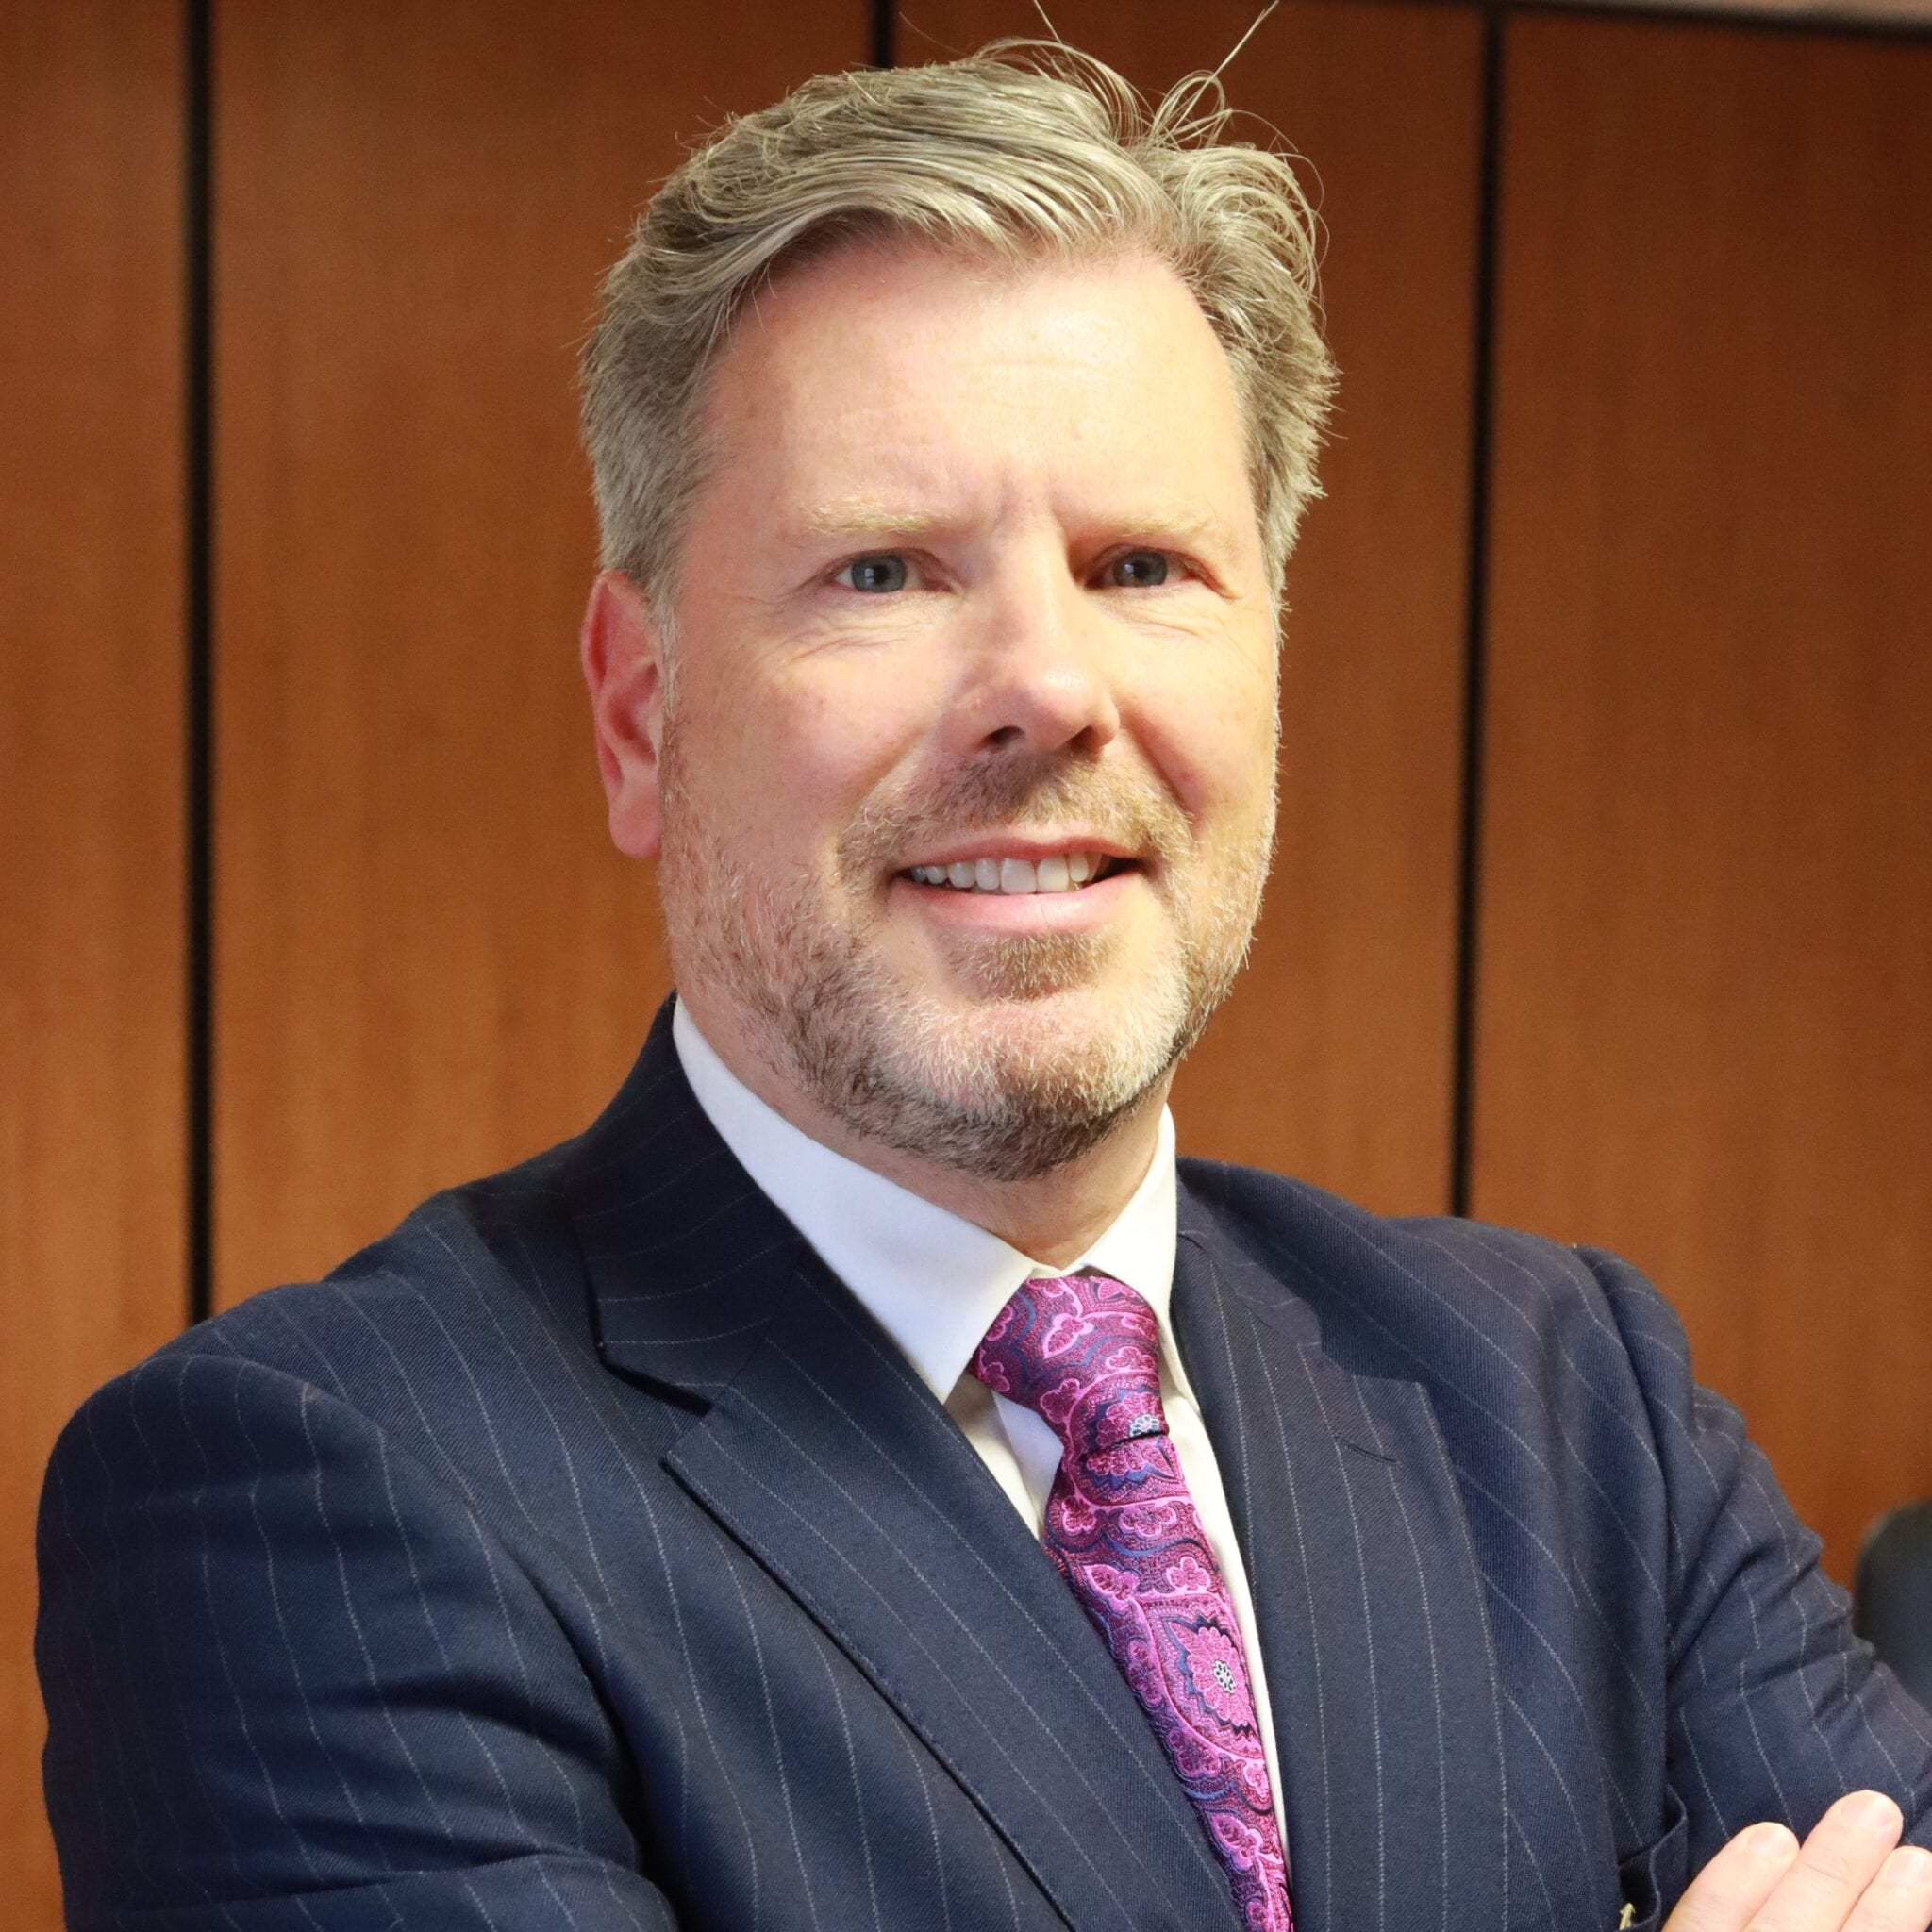 Martin O'Kane